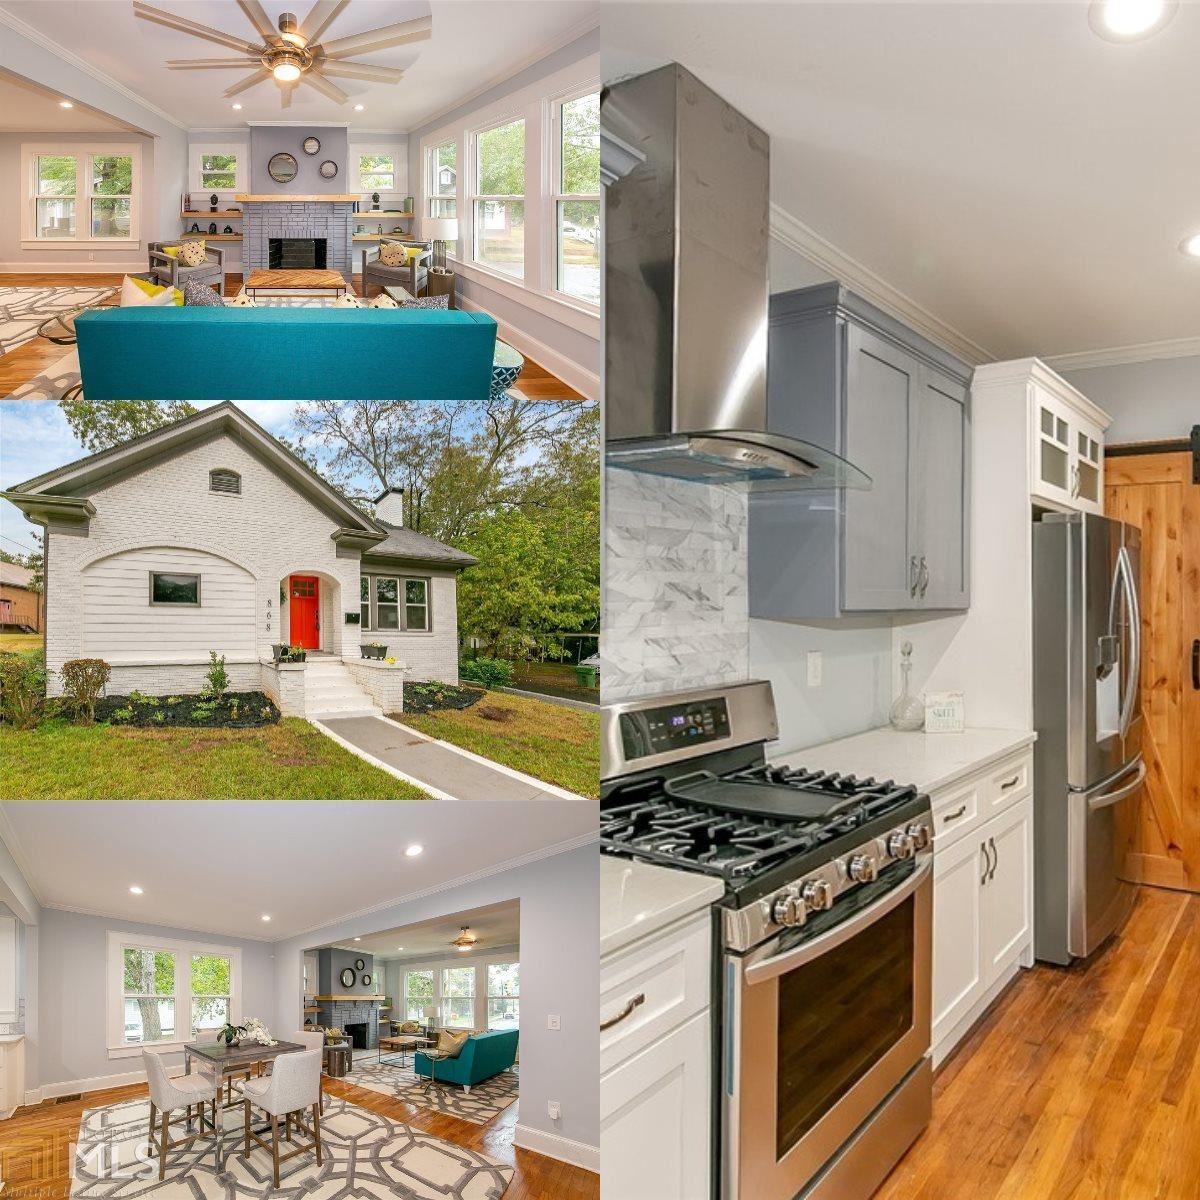 868 Cascade Rd, Atlanta, GA 30311 - MLS#: 8869239